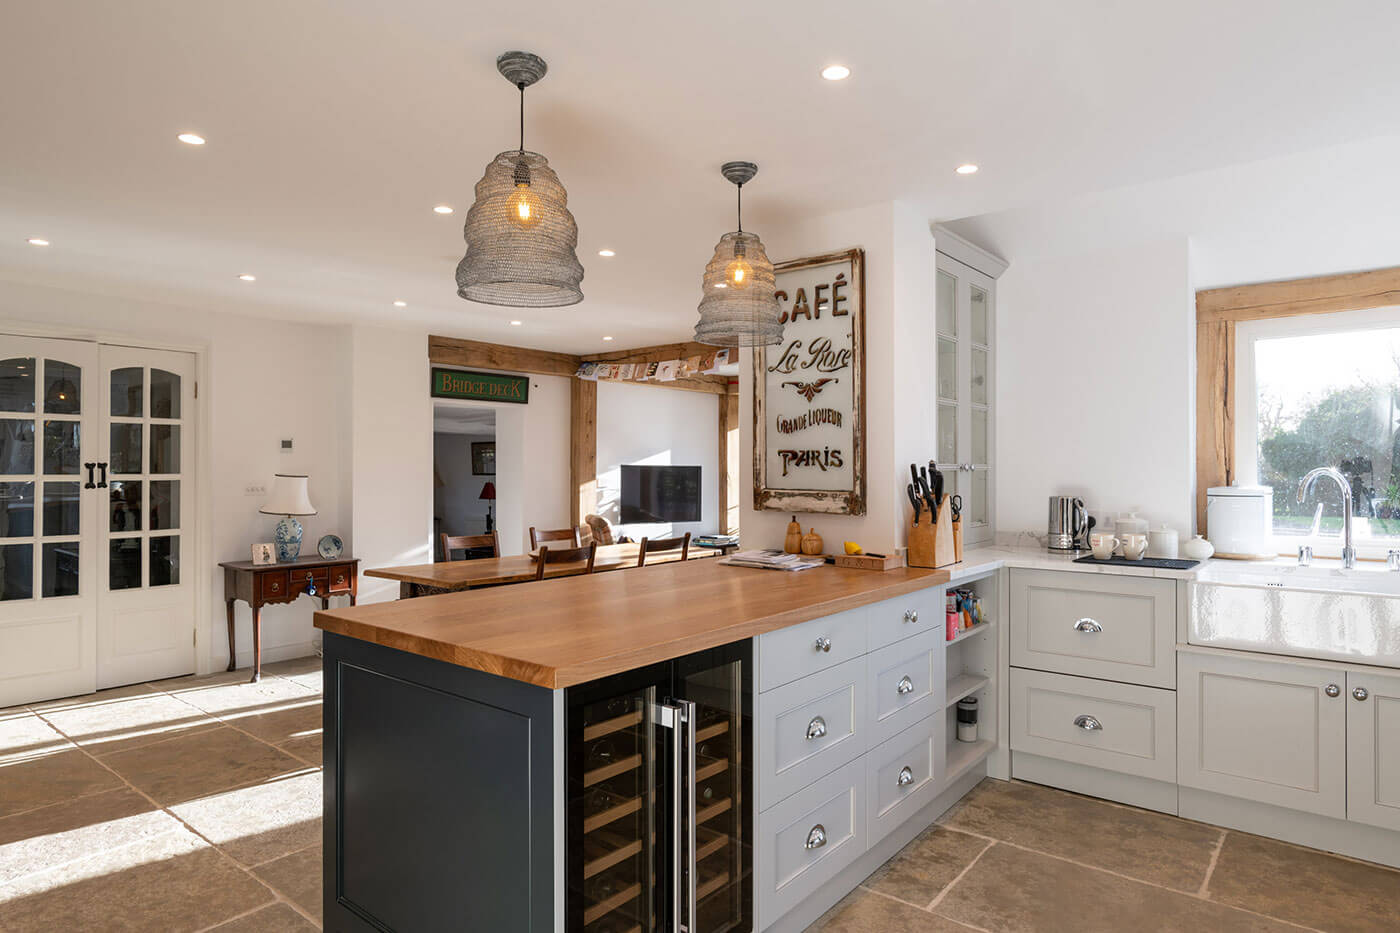 Limestone kitchen flooring